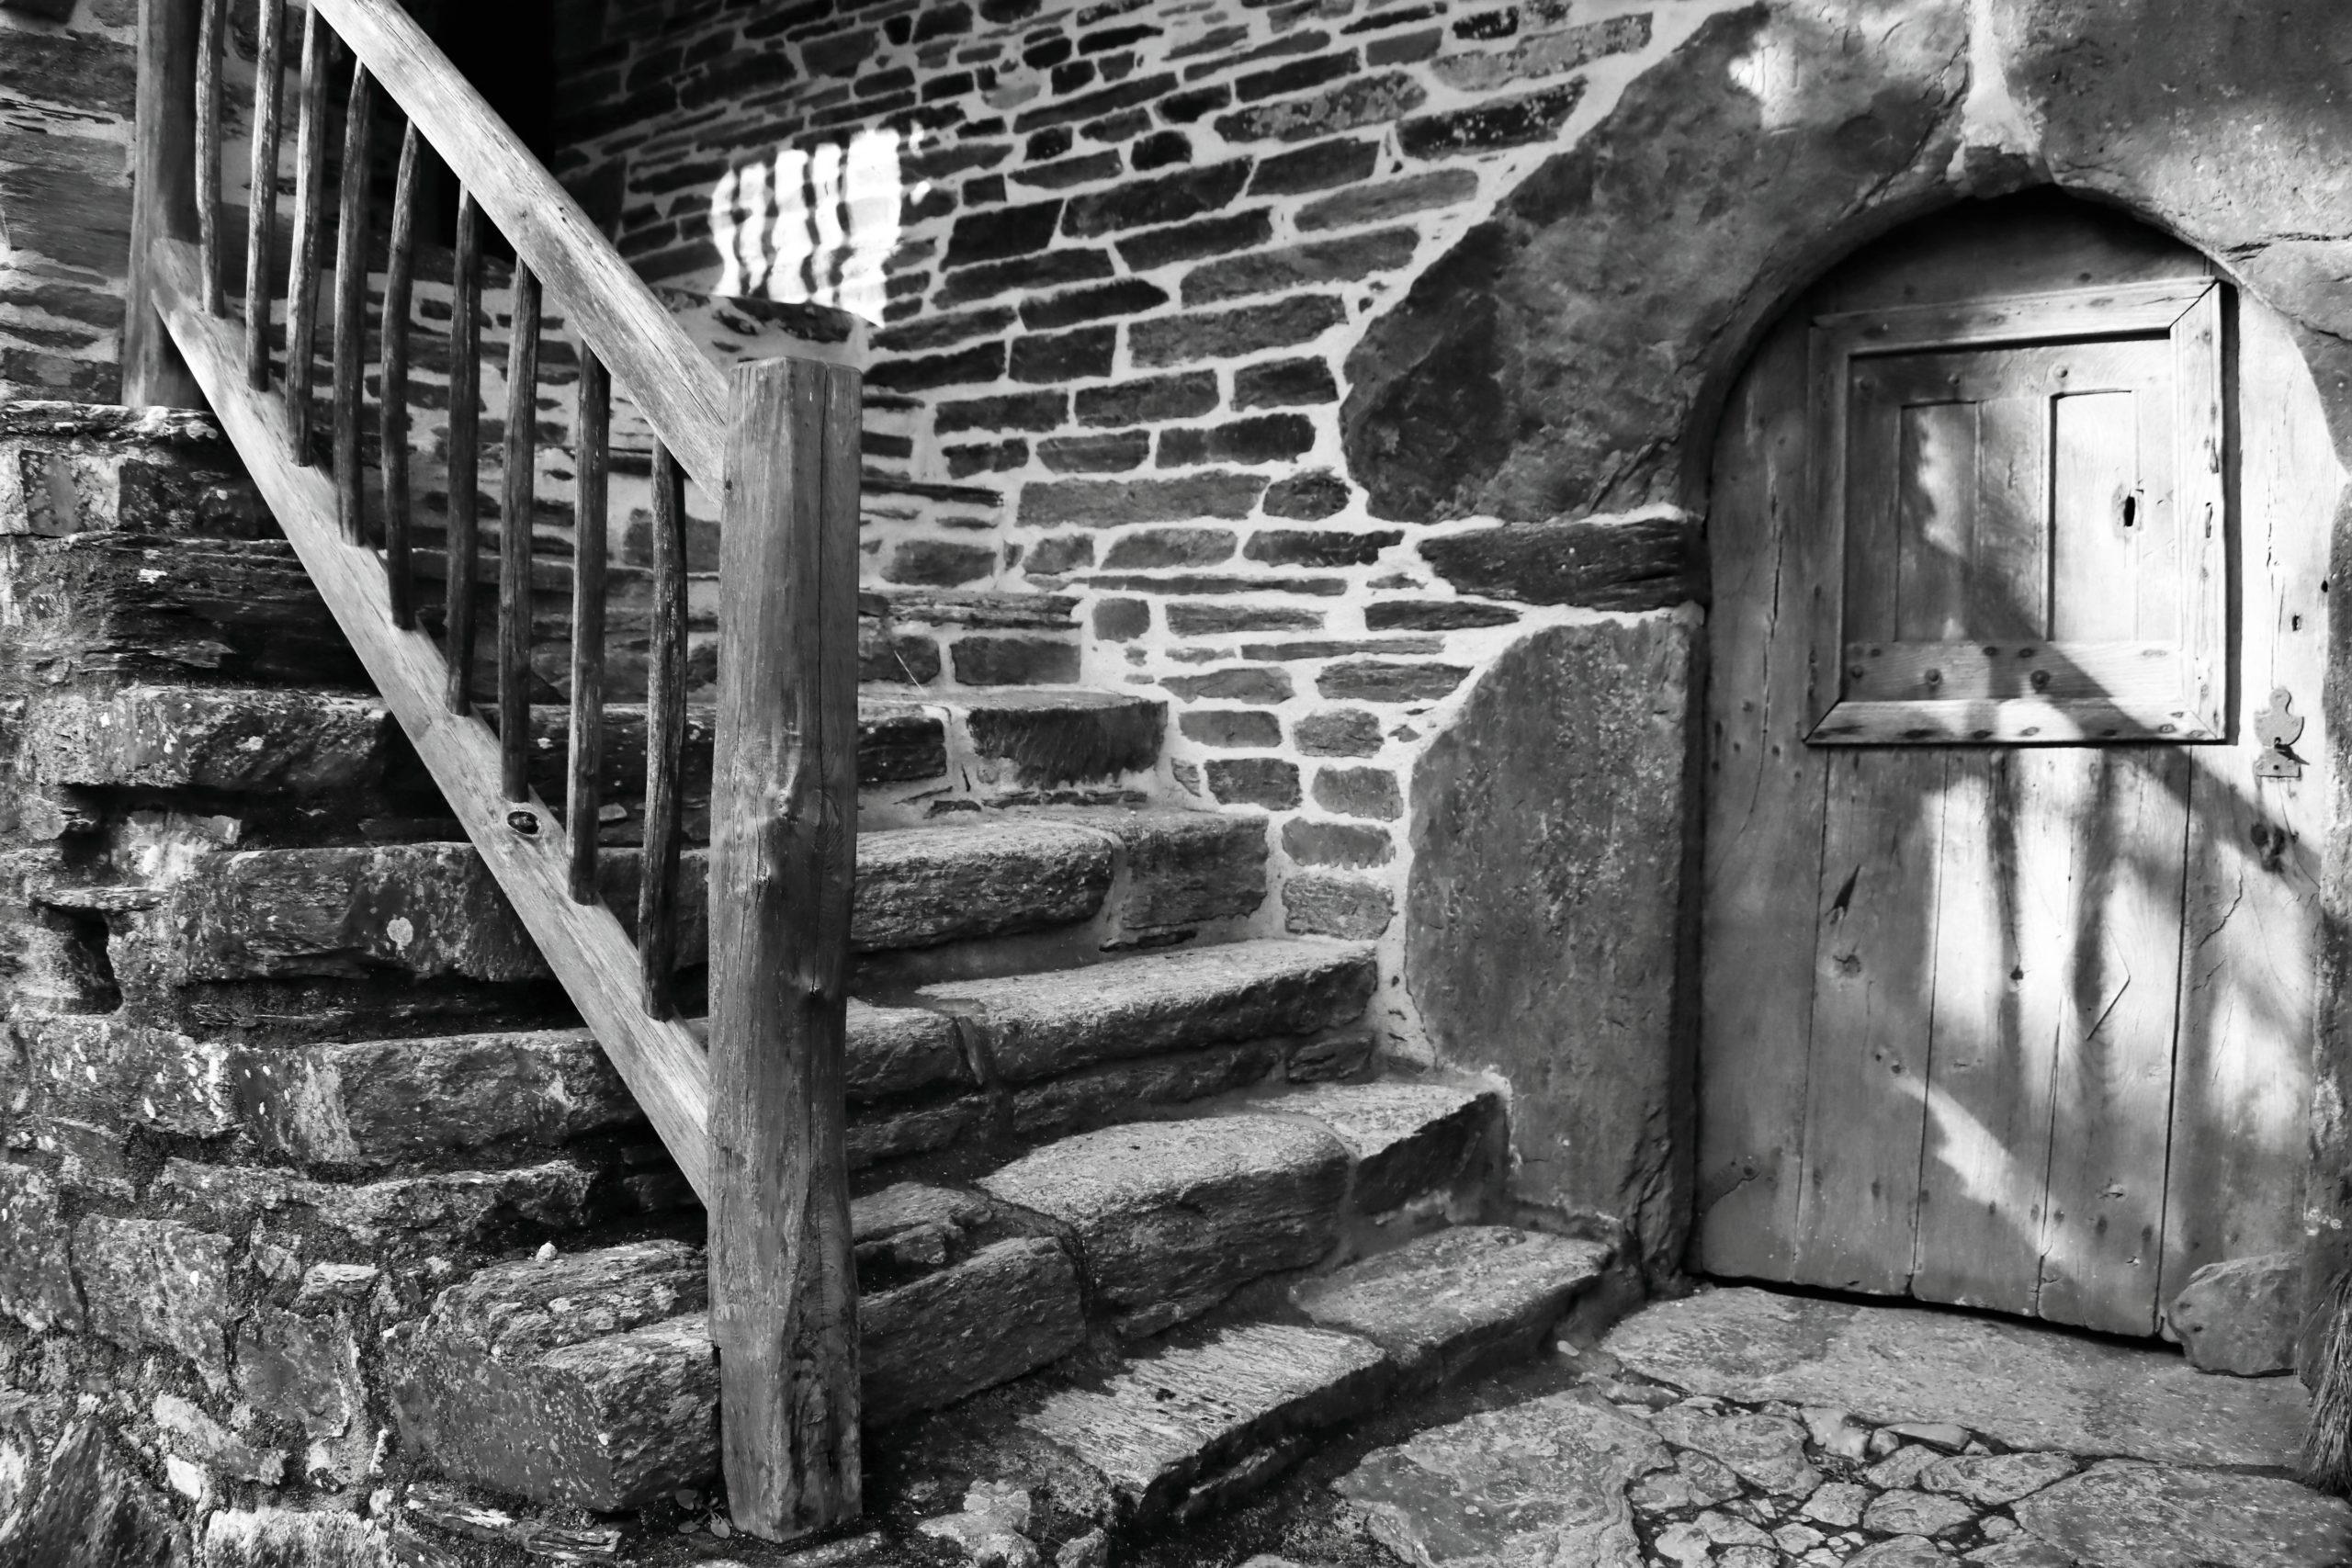 2021-02-Escaliers-02-ALM